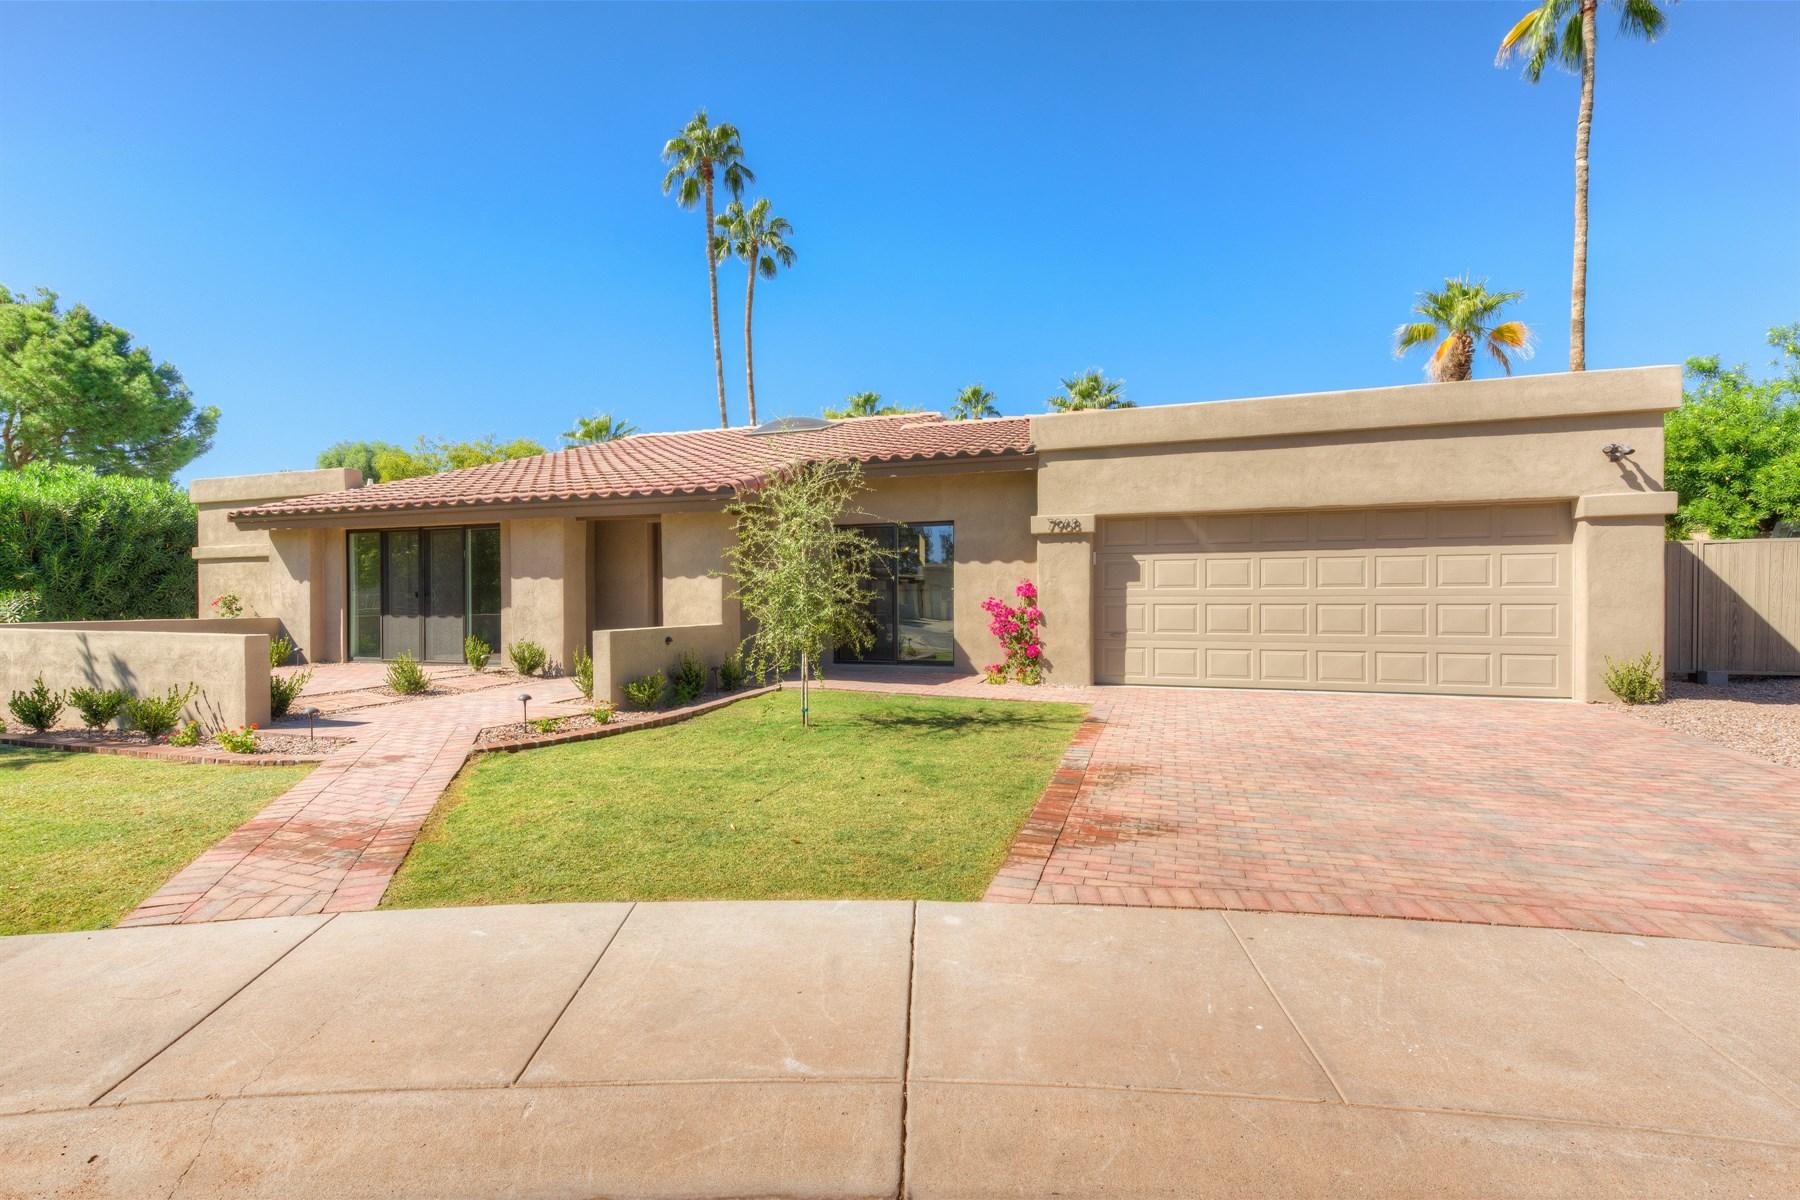 独户住宅 为 销售 在 Exceptional remodel in the heart of McCormick Ranch 7968 E Via Marina 斯科茨代尔, 亚利桑那州, 85258 美国